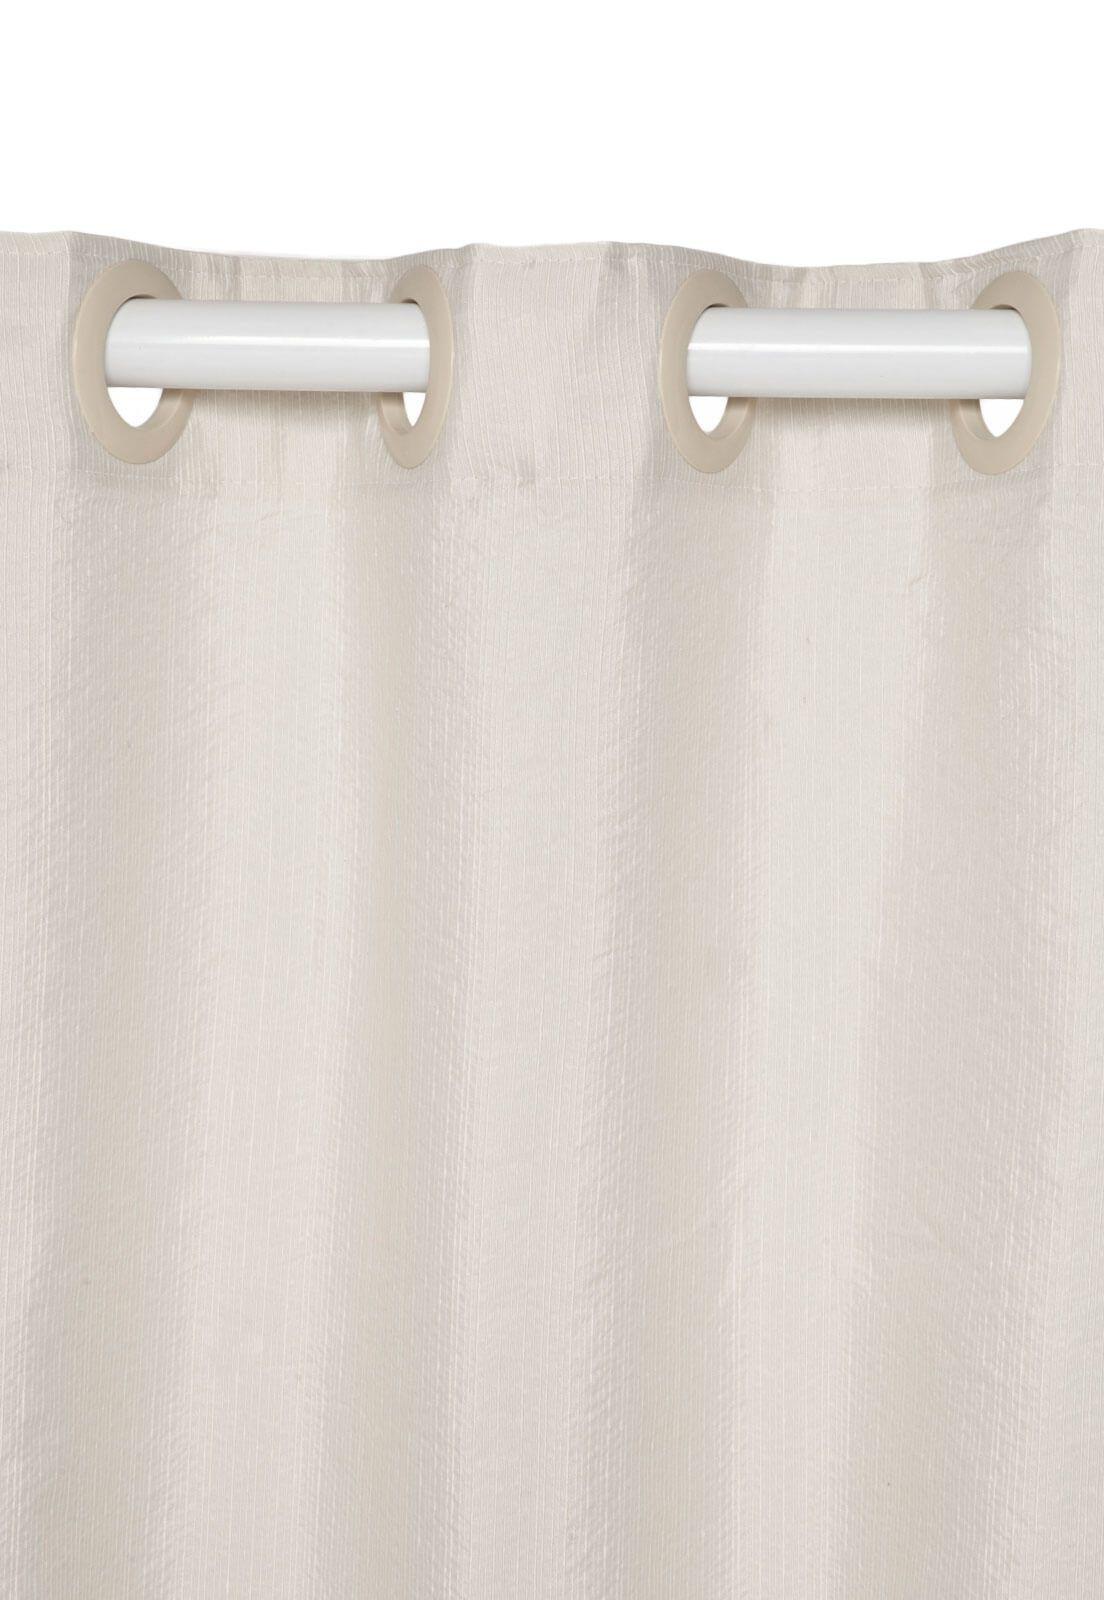 Cortina Rústica New Pantex Marfim 2,60 x 2,30 Bella Janela